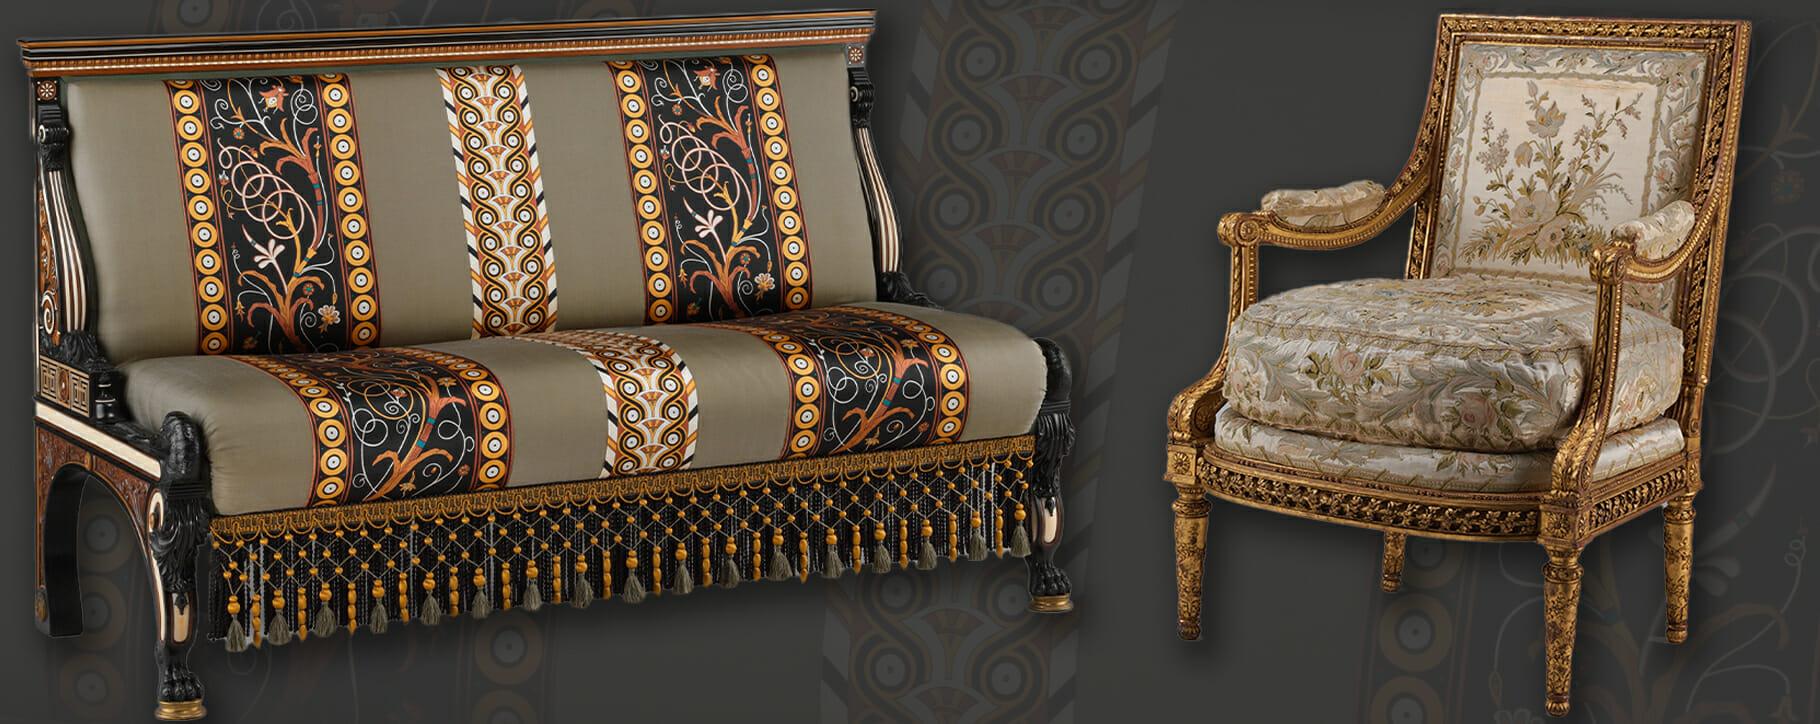 Textile Furniture Examples